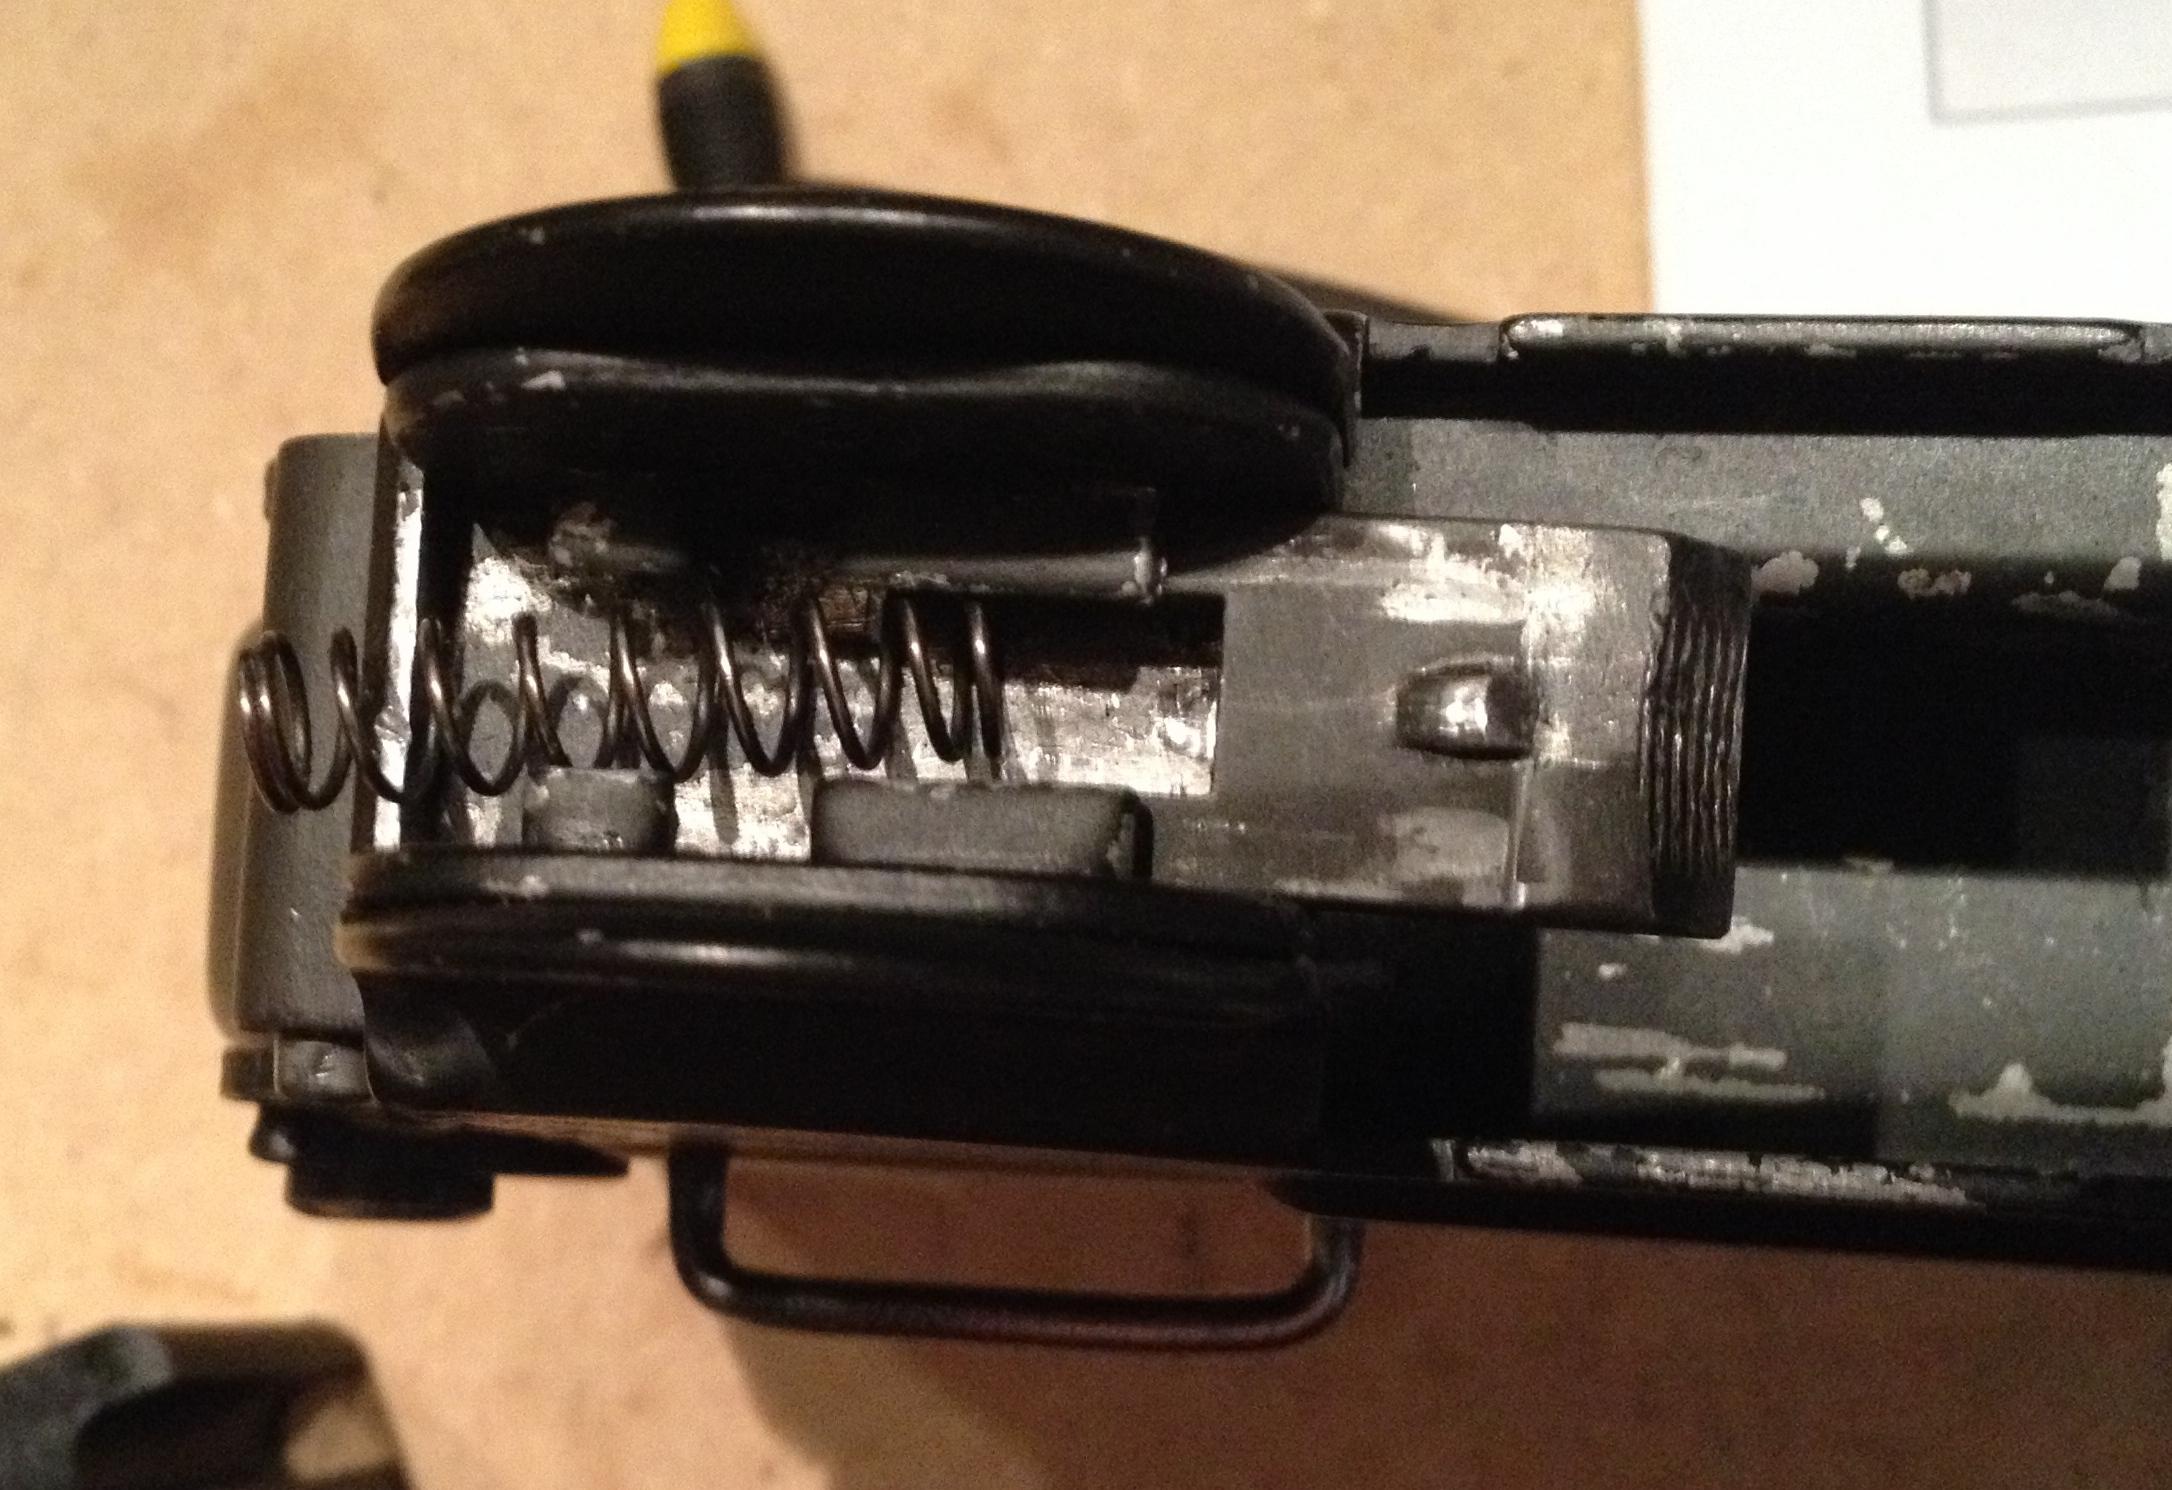 Building the Fully Legal Semi Automatic UZI Carbine